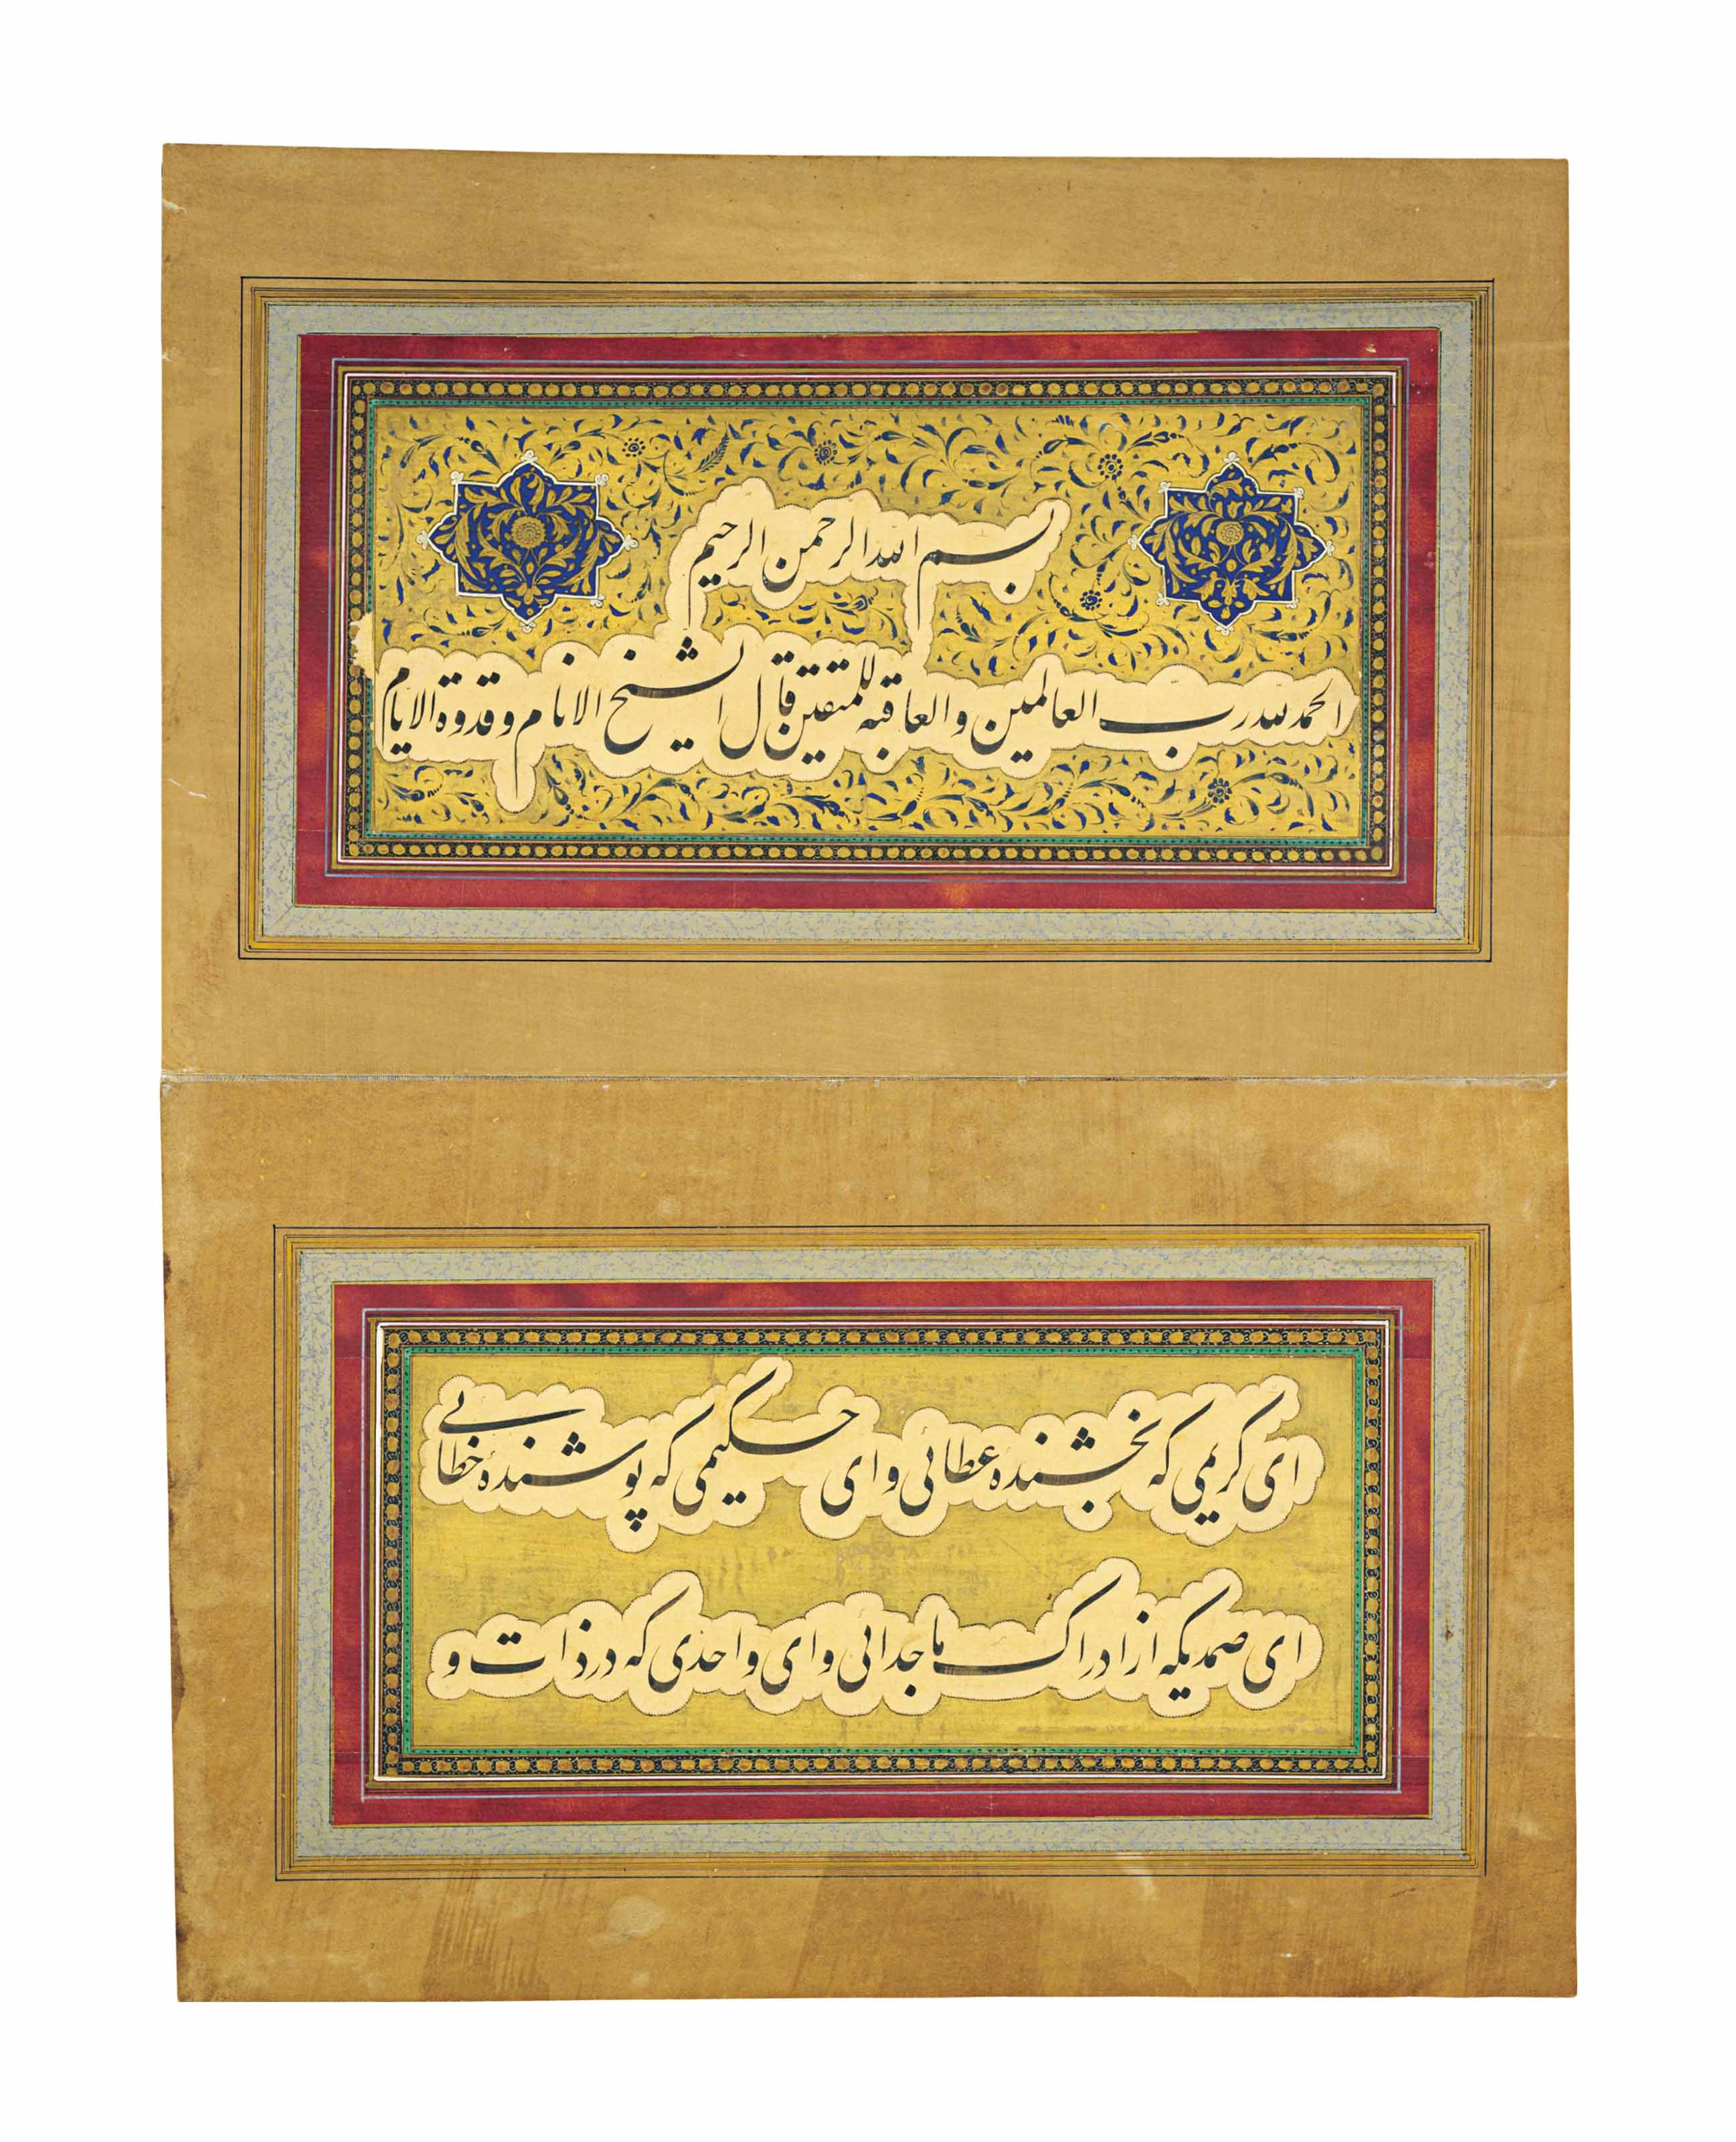 ABU ISMA'IL 'ABDULLAH AL-ANSAR